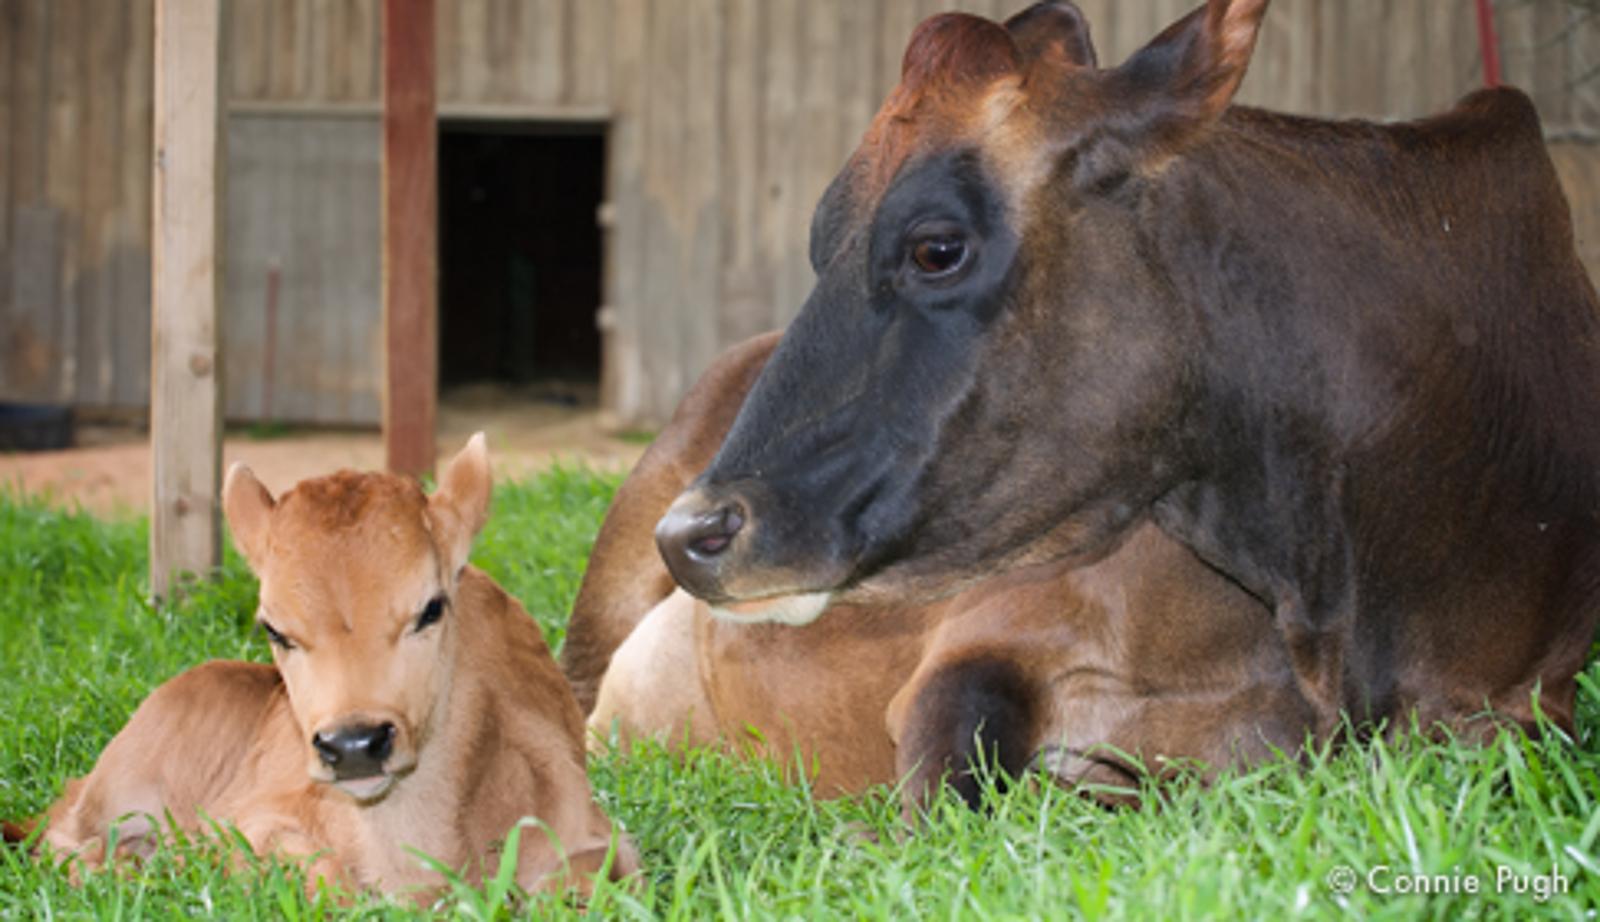 6 Amazing Ways Farm Animal Moms Show Love For Their Babies